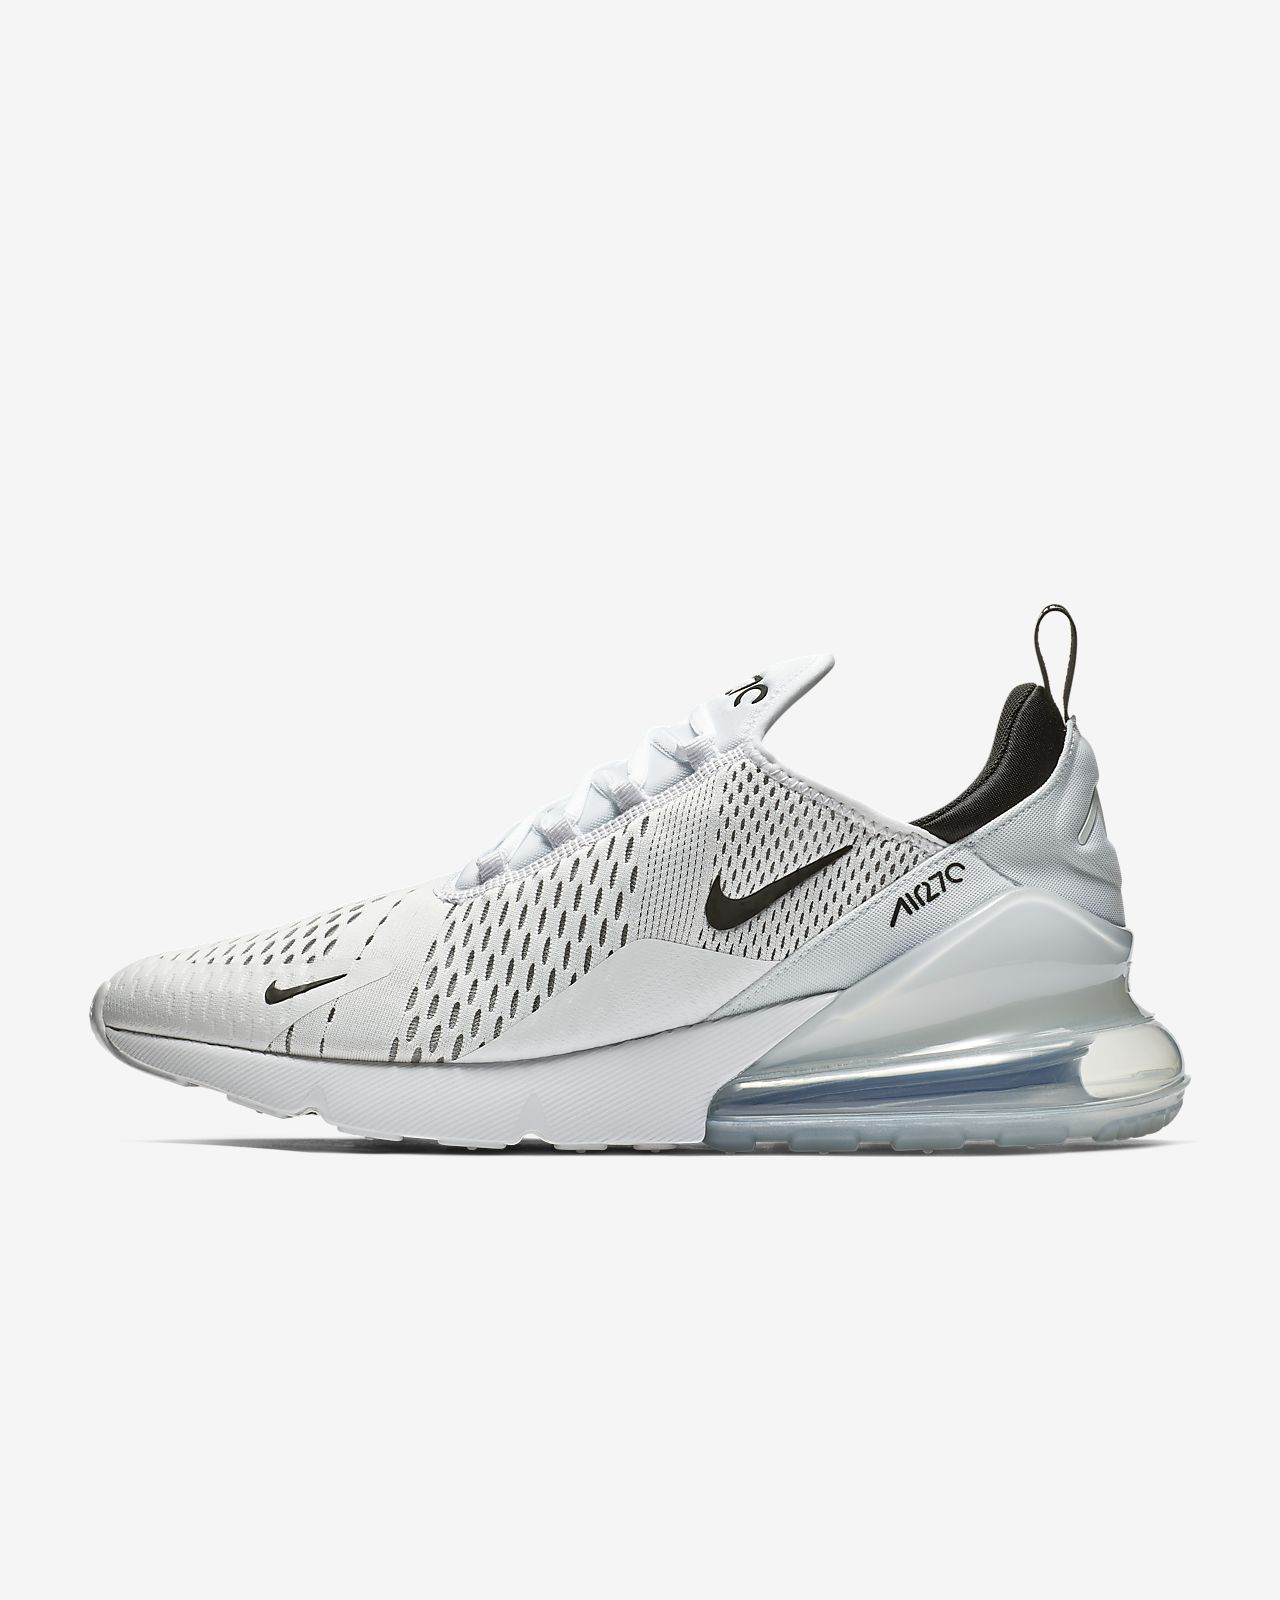 Flying track shoe clipart 1000 x 1000 image freeuse stock Nike Air Max 270 Men\'s Shoe image freeuse stock